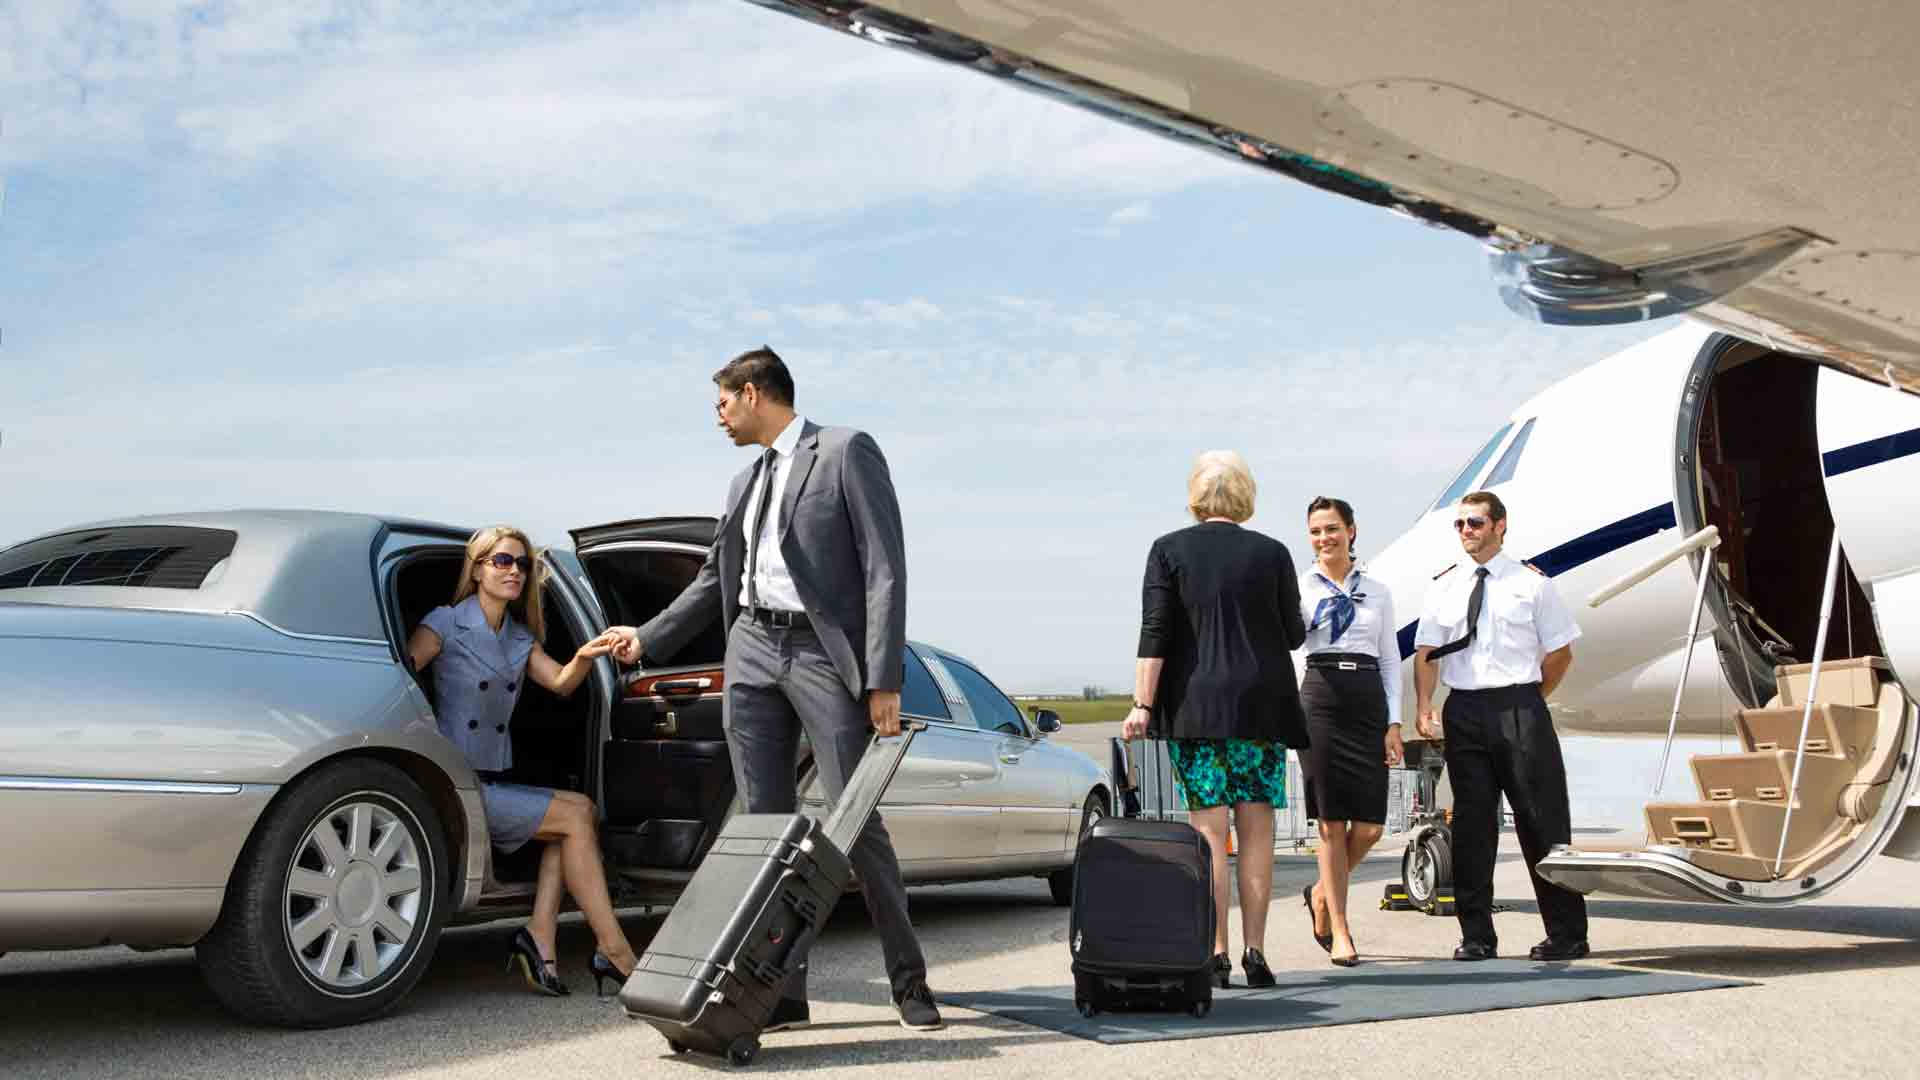 Adagold Luxe Impress Investors Private Jet Charter